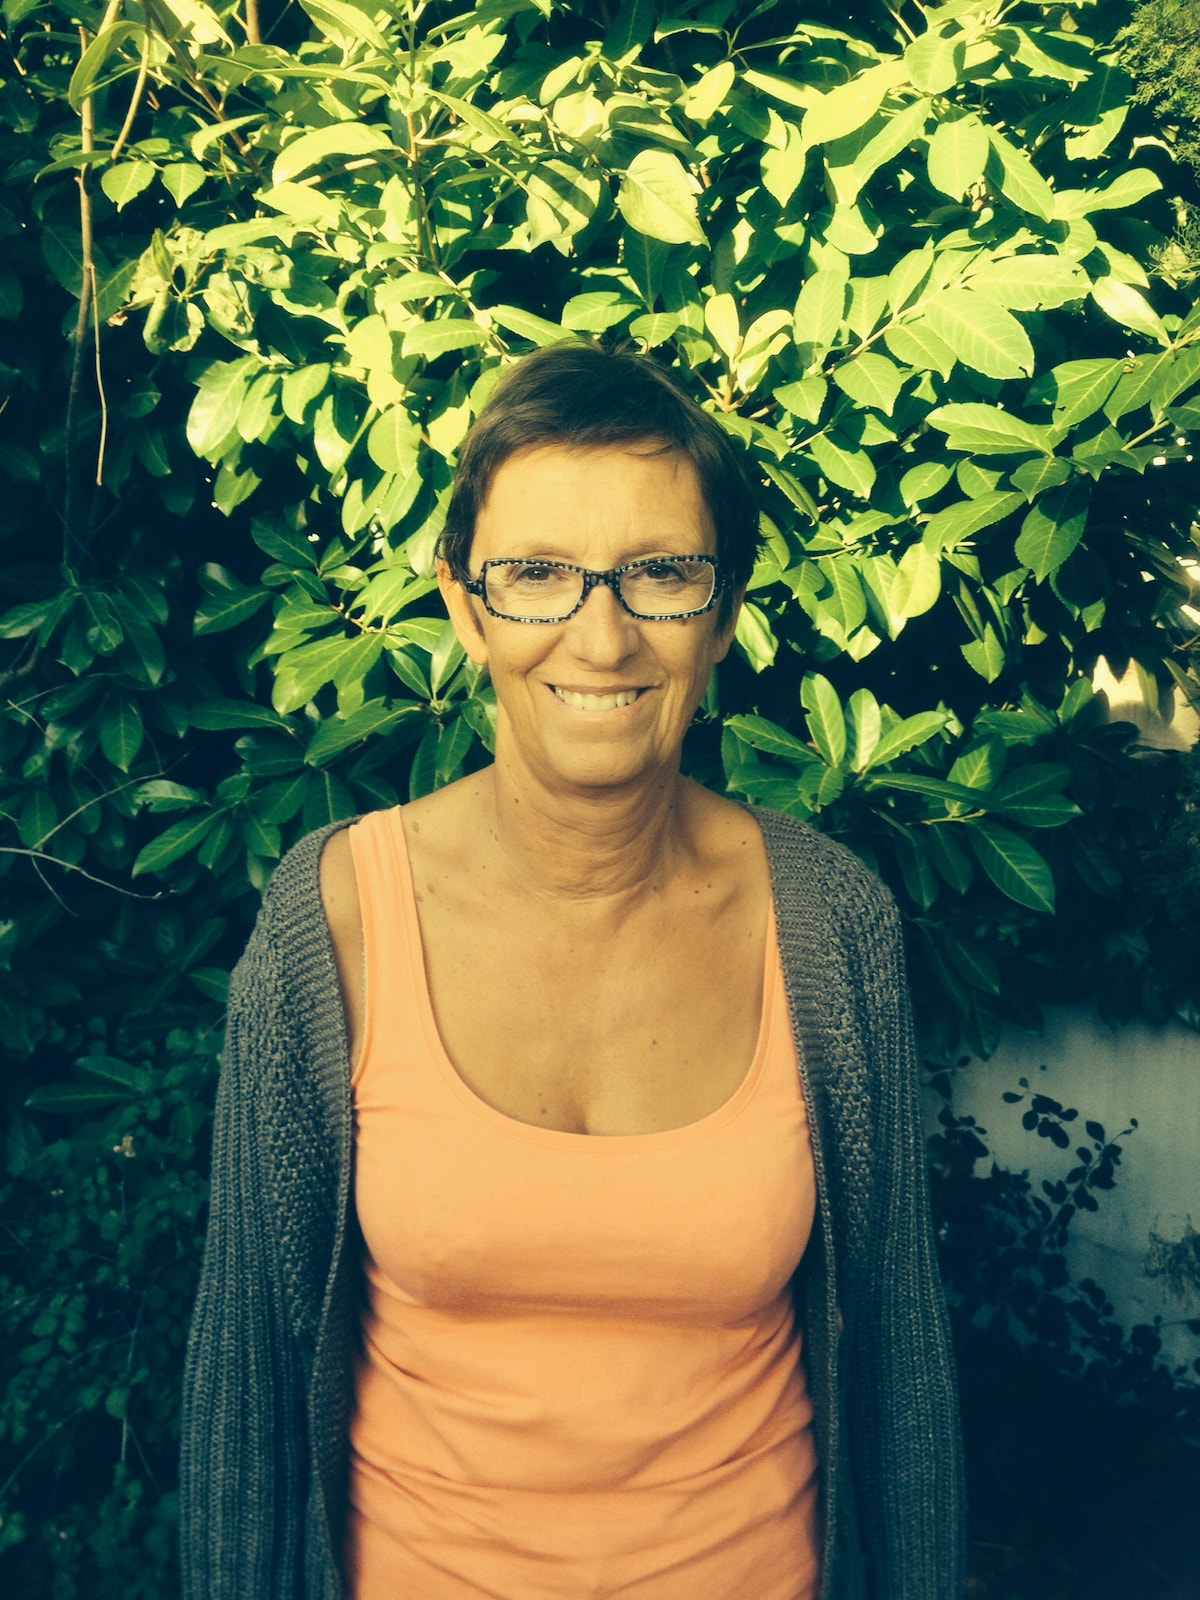 Marie-Agnès from Nieul-sur-Mer